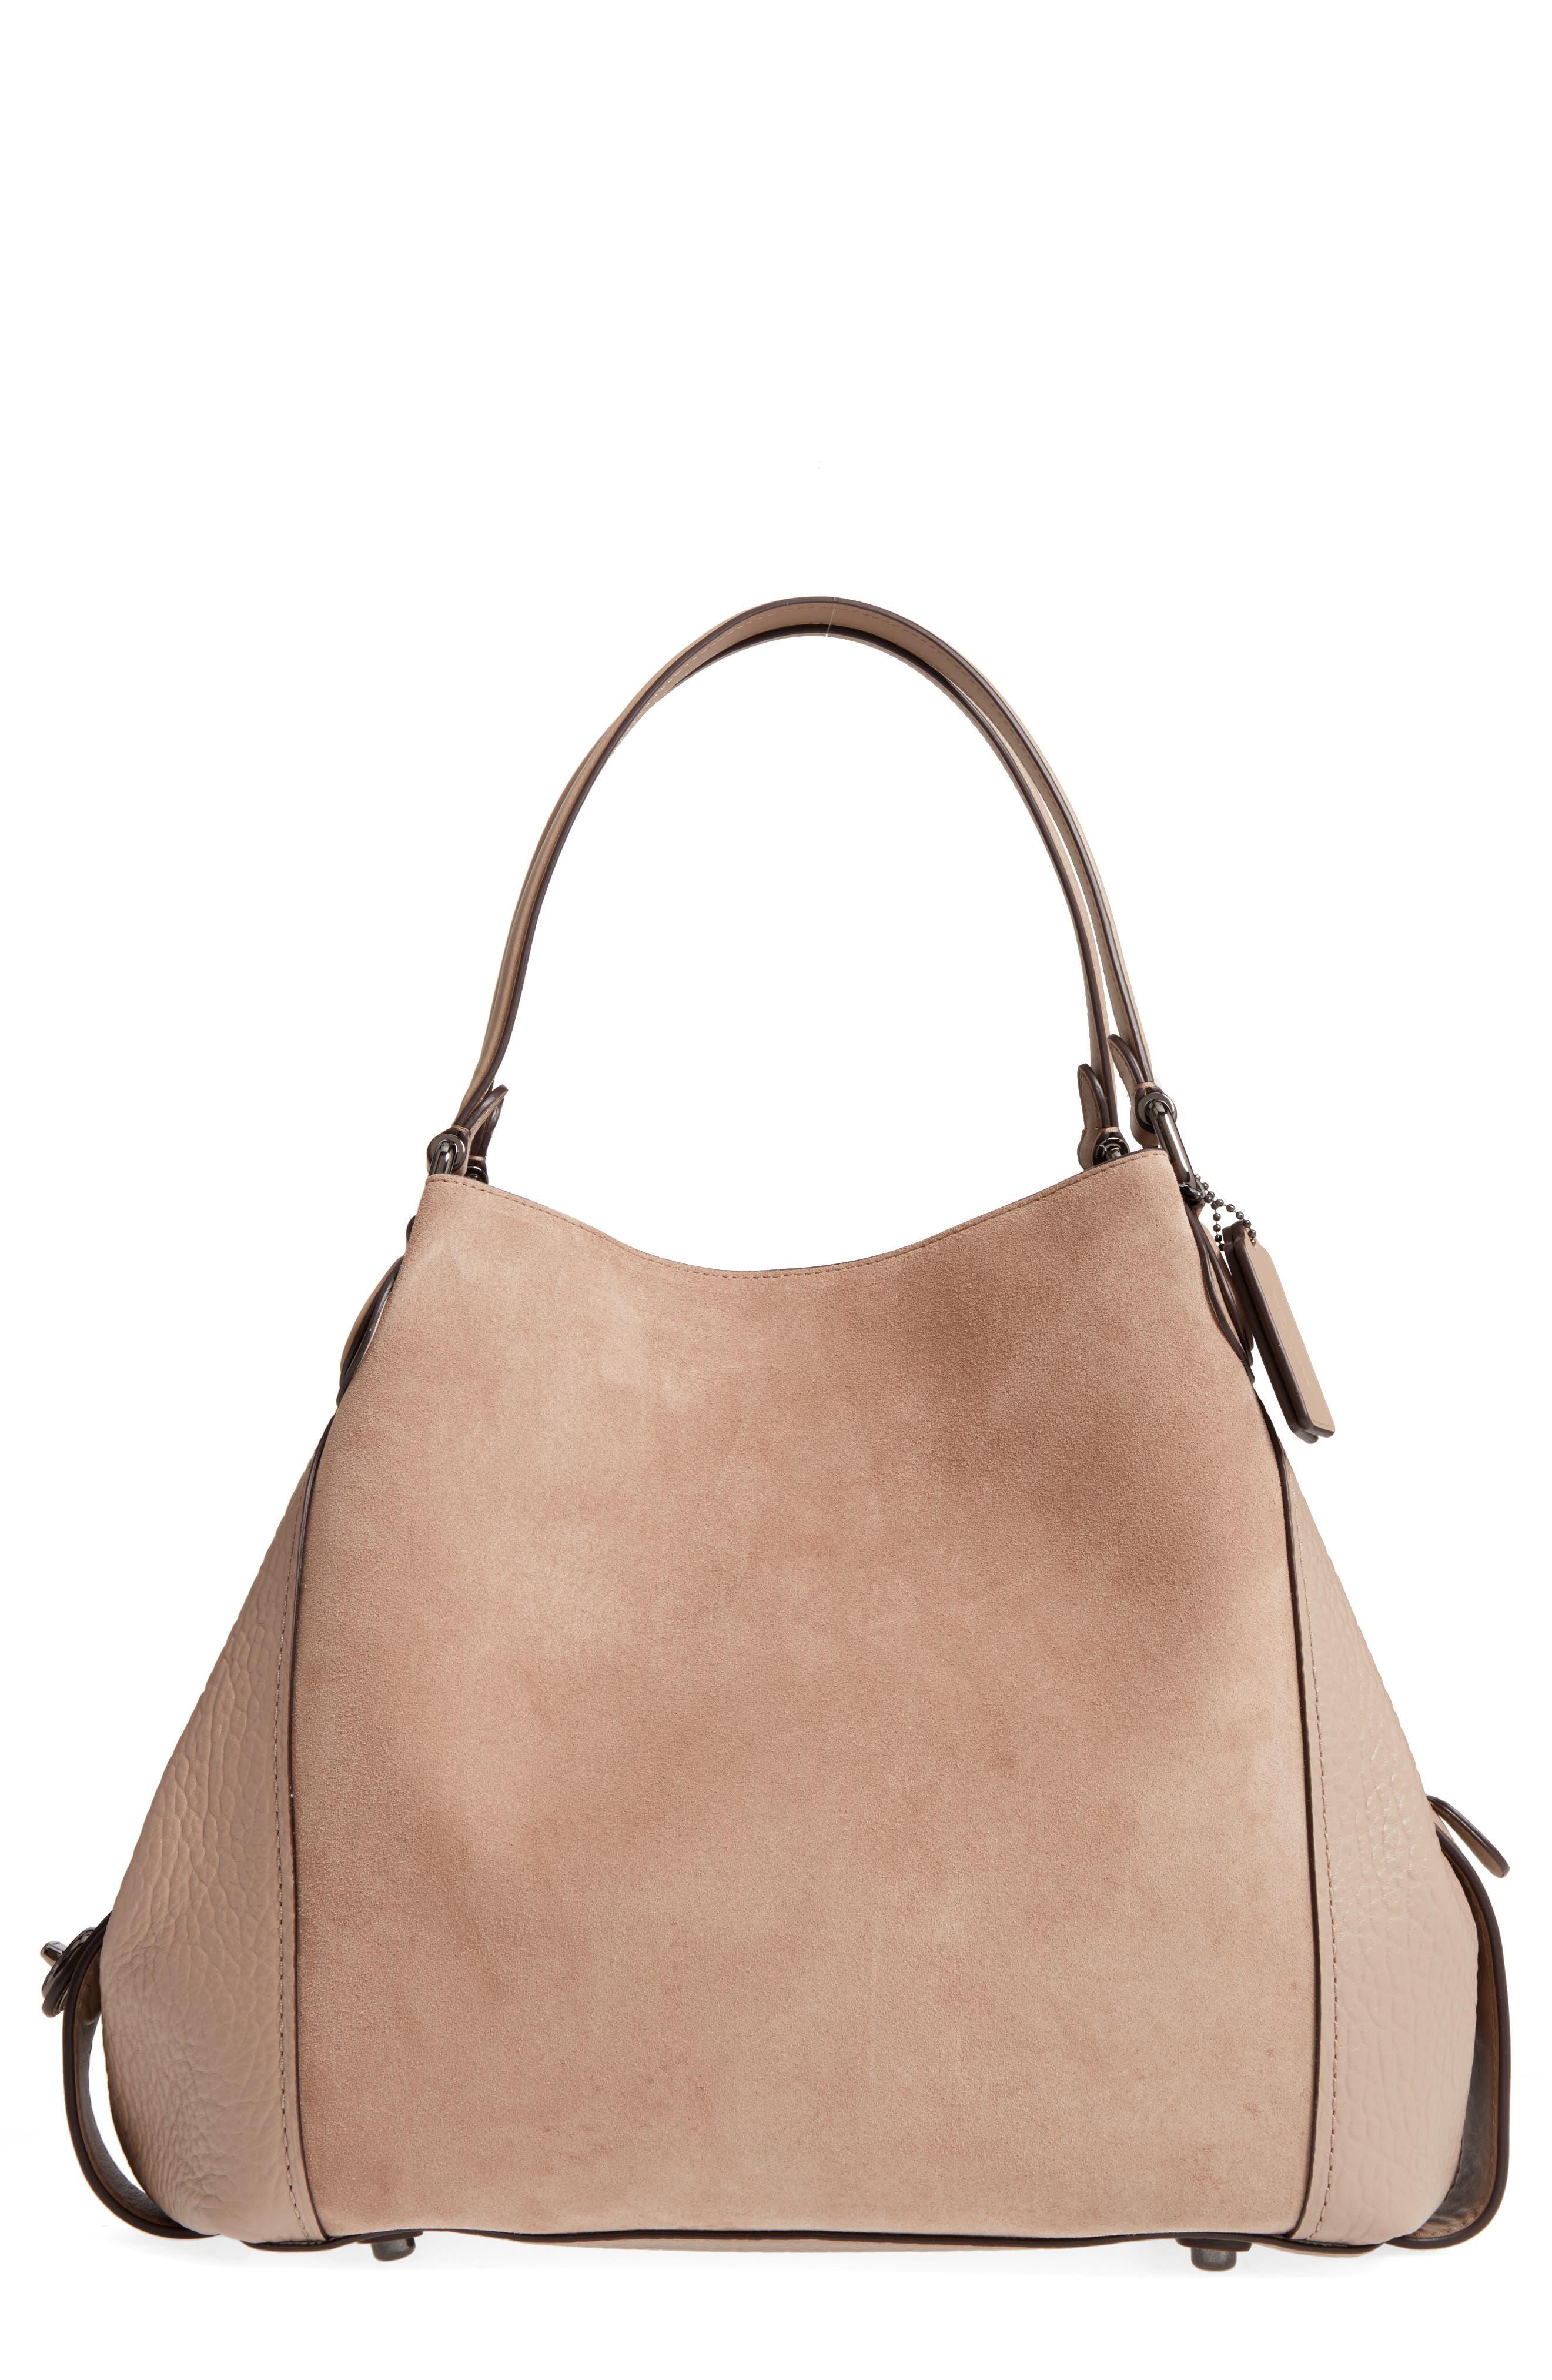 COACH Edie Suede & Leather Shoulder Bag